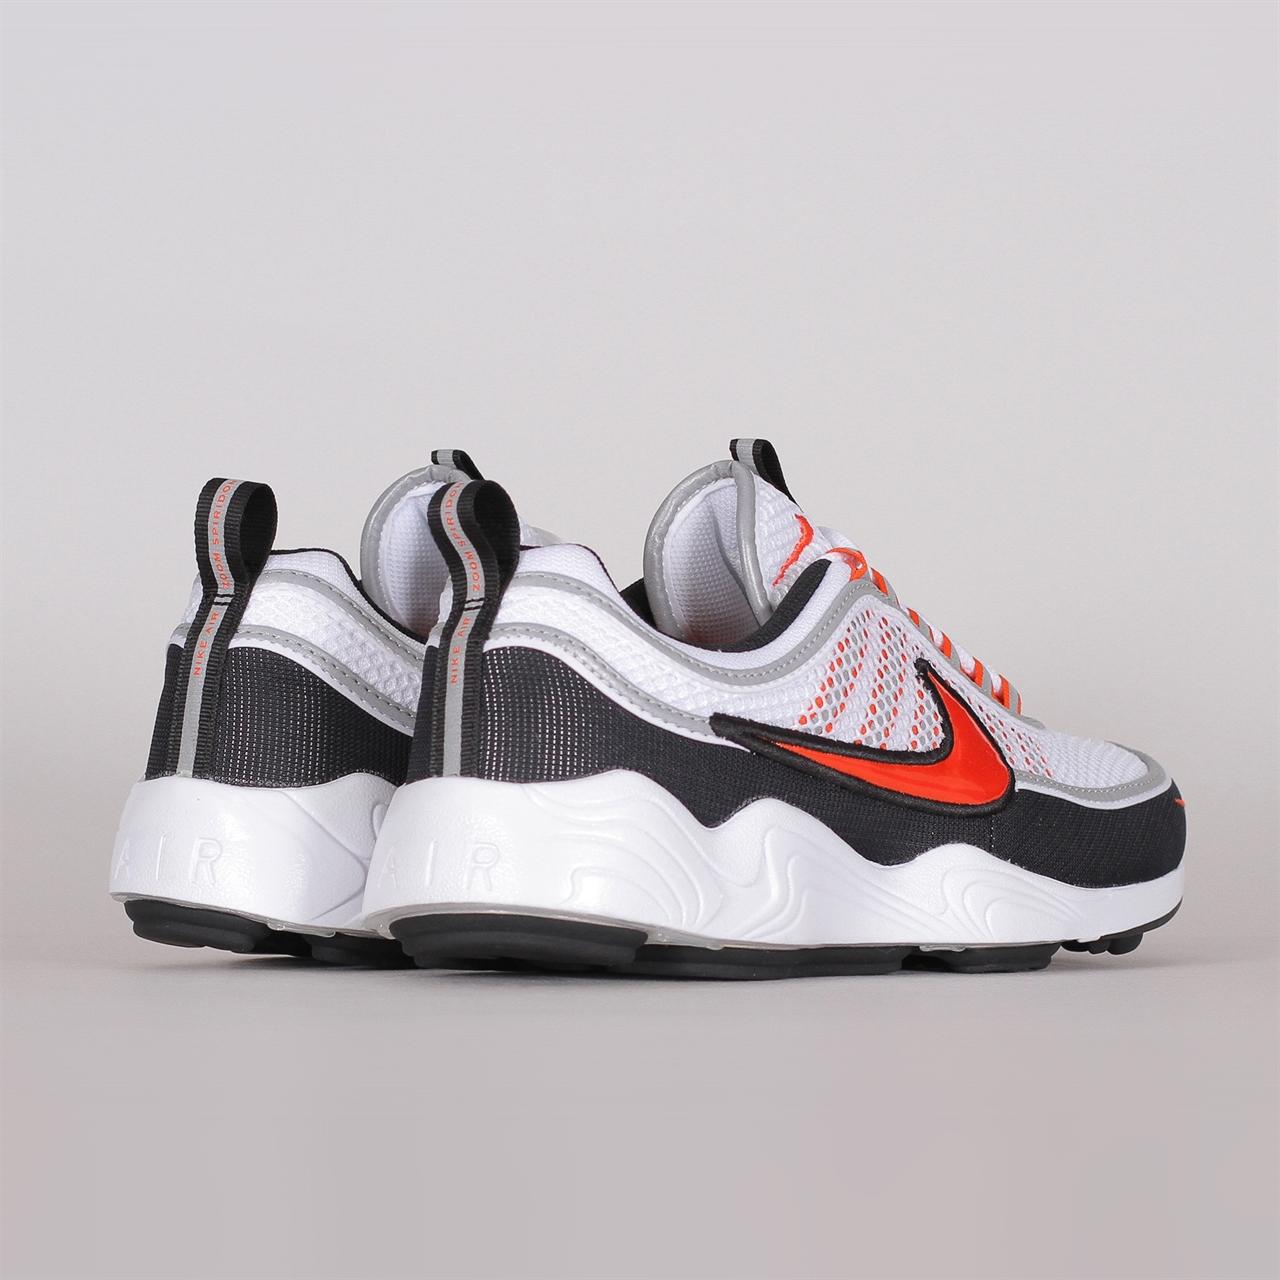 49d5f81b5084 Nike SportswearNike Sportswear Air Zoom Spiridon  16 (926955-106). 1